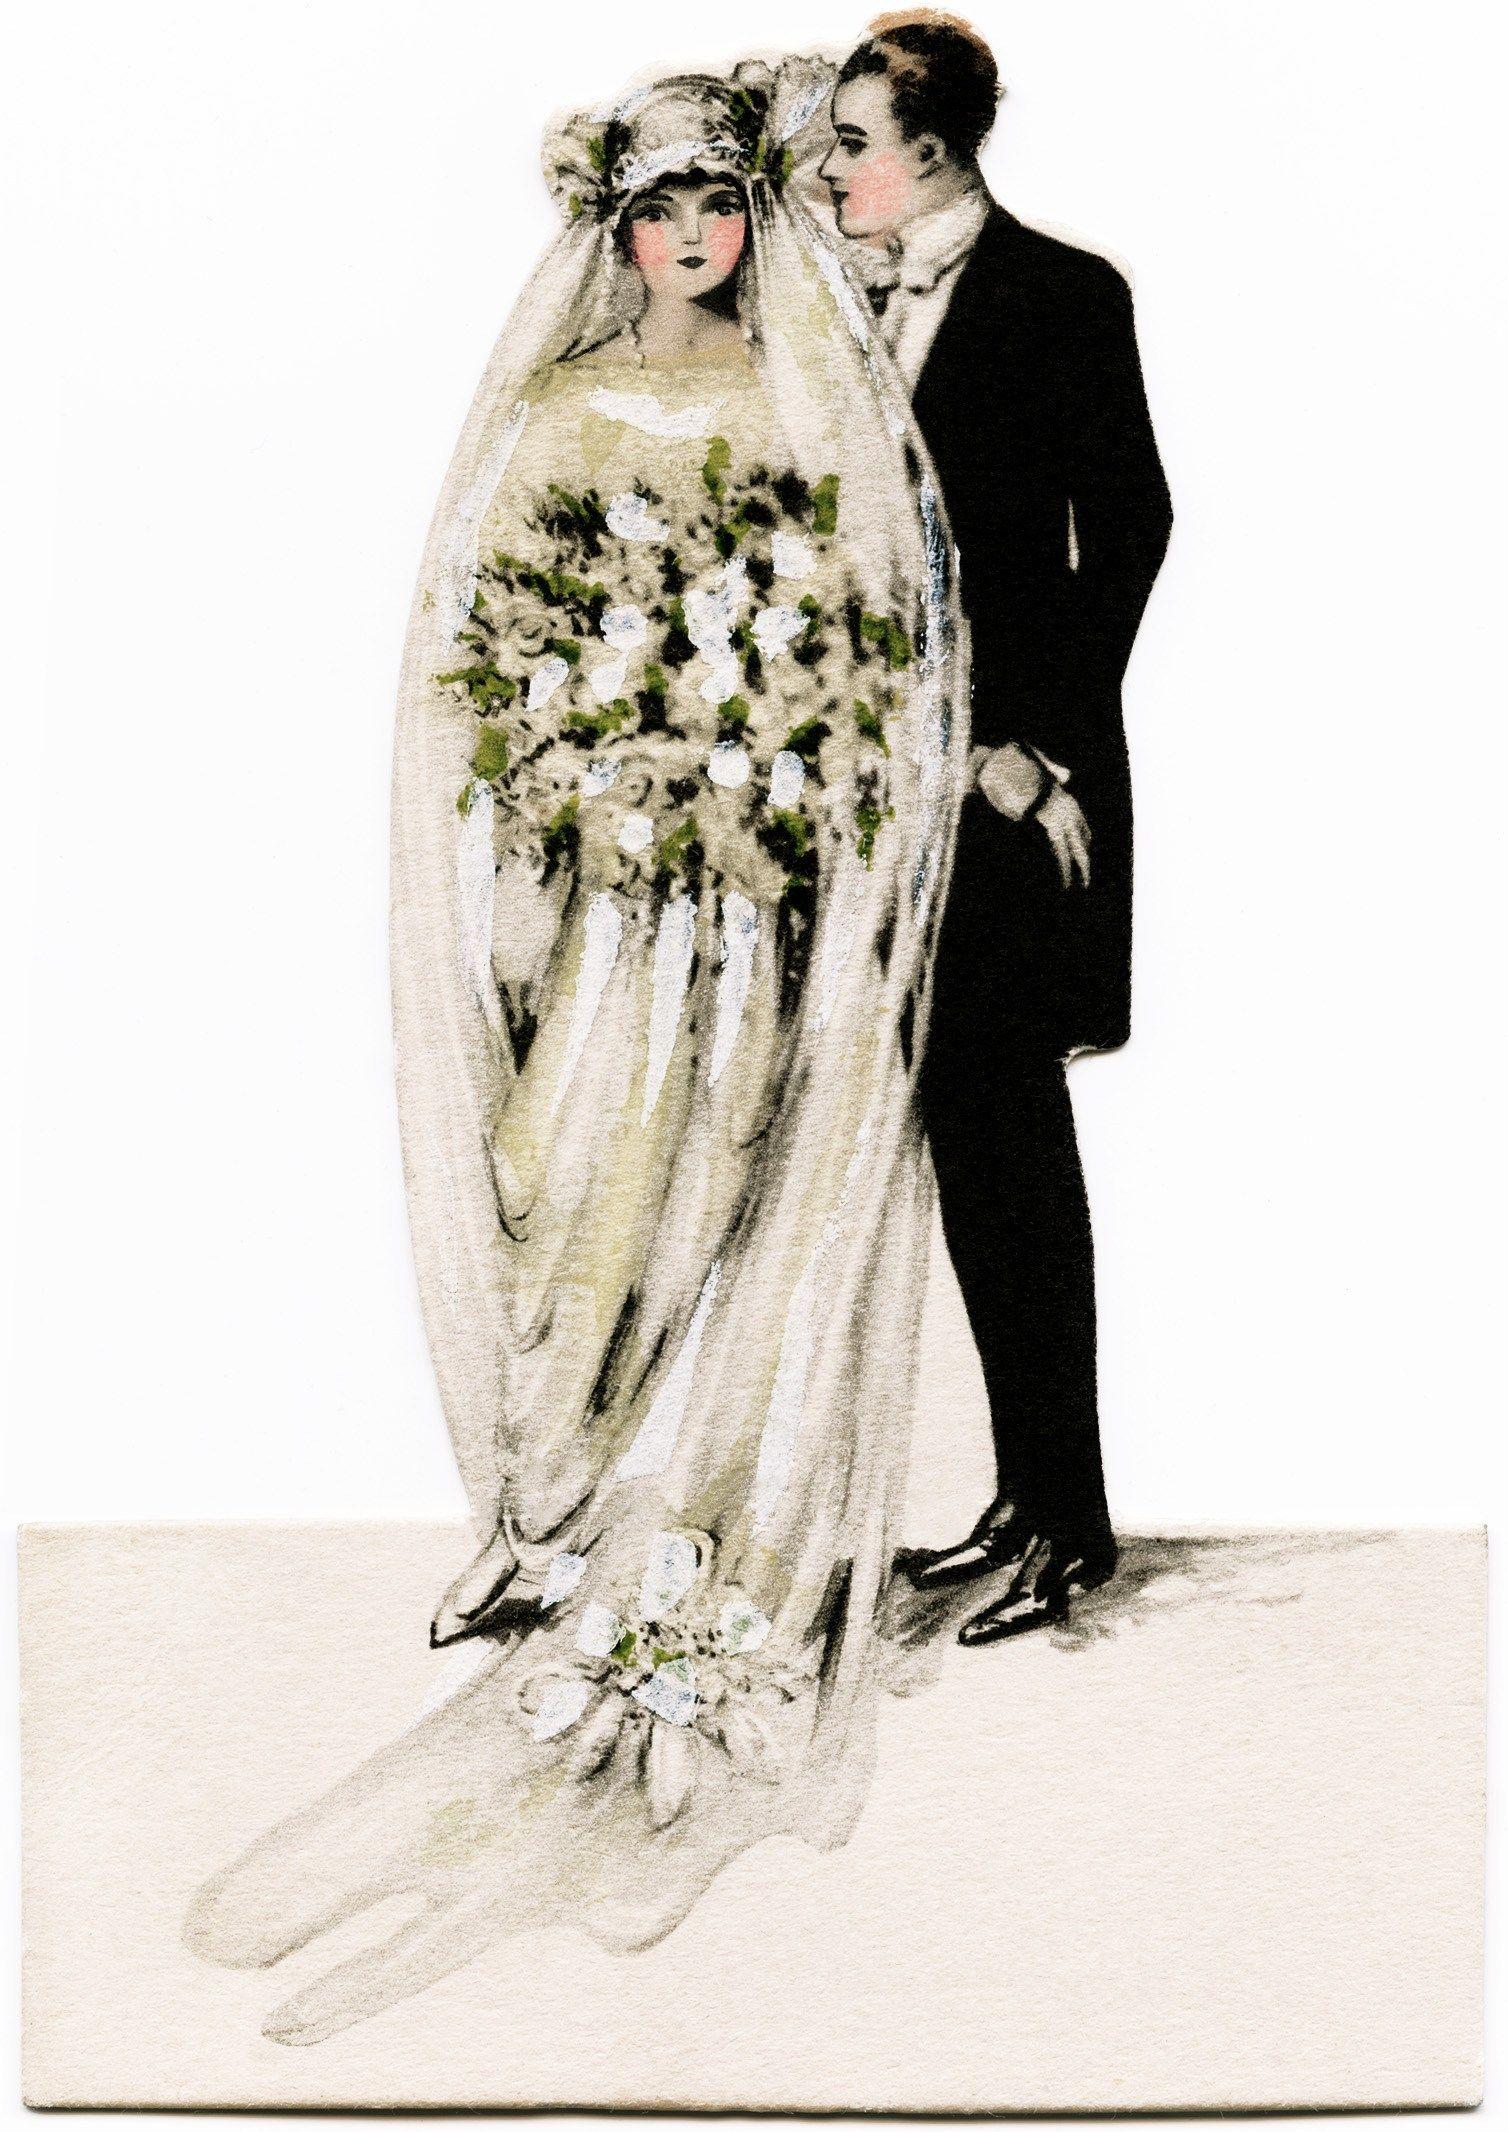 Victorian bride and groom, vintage wedding clipart, antique.